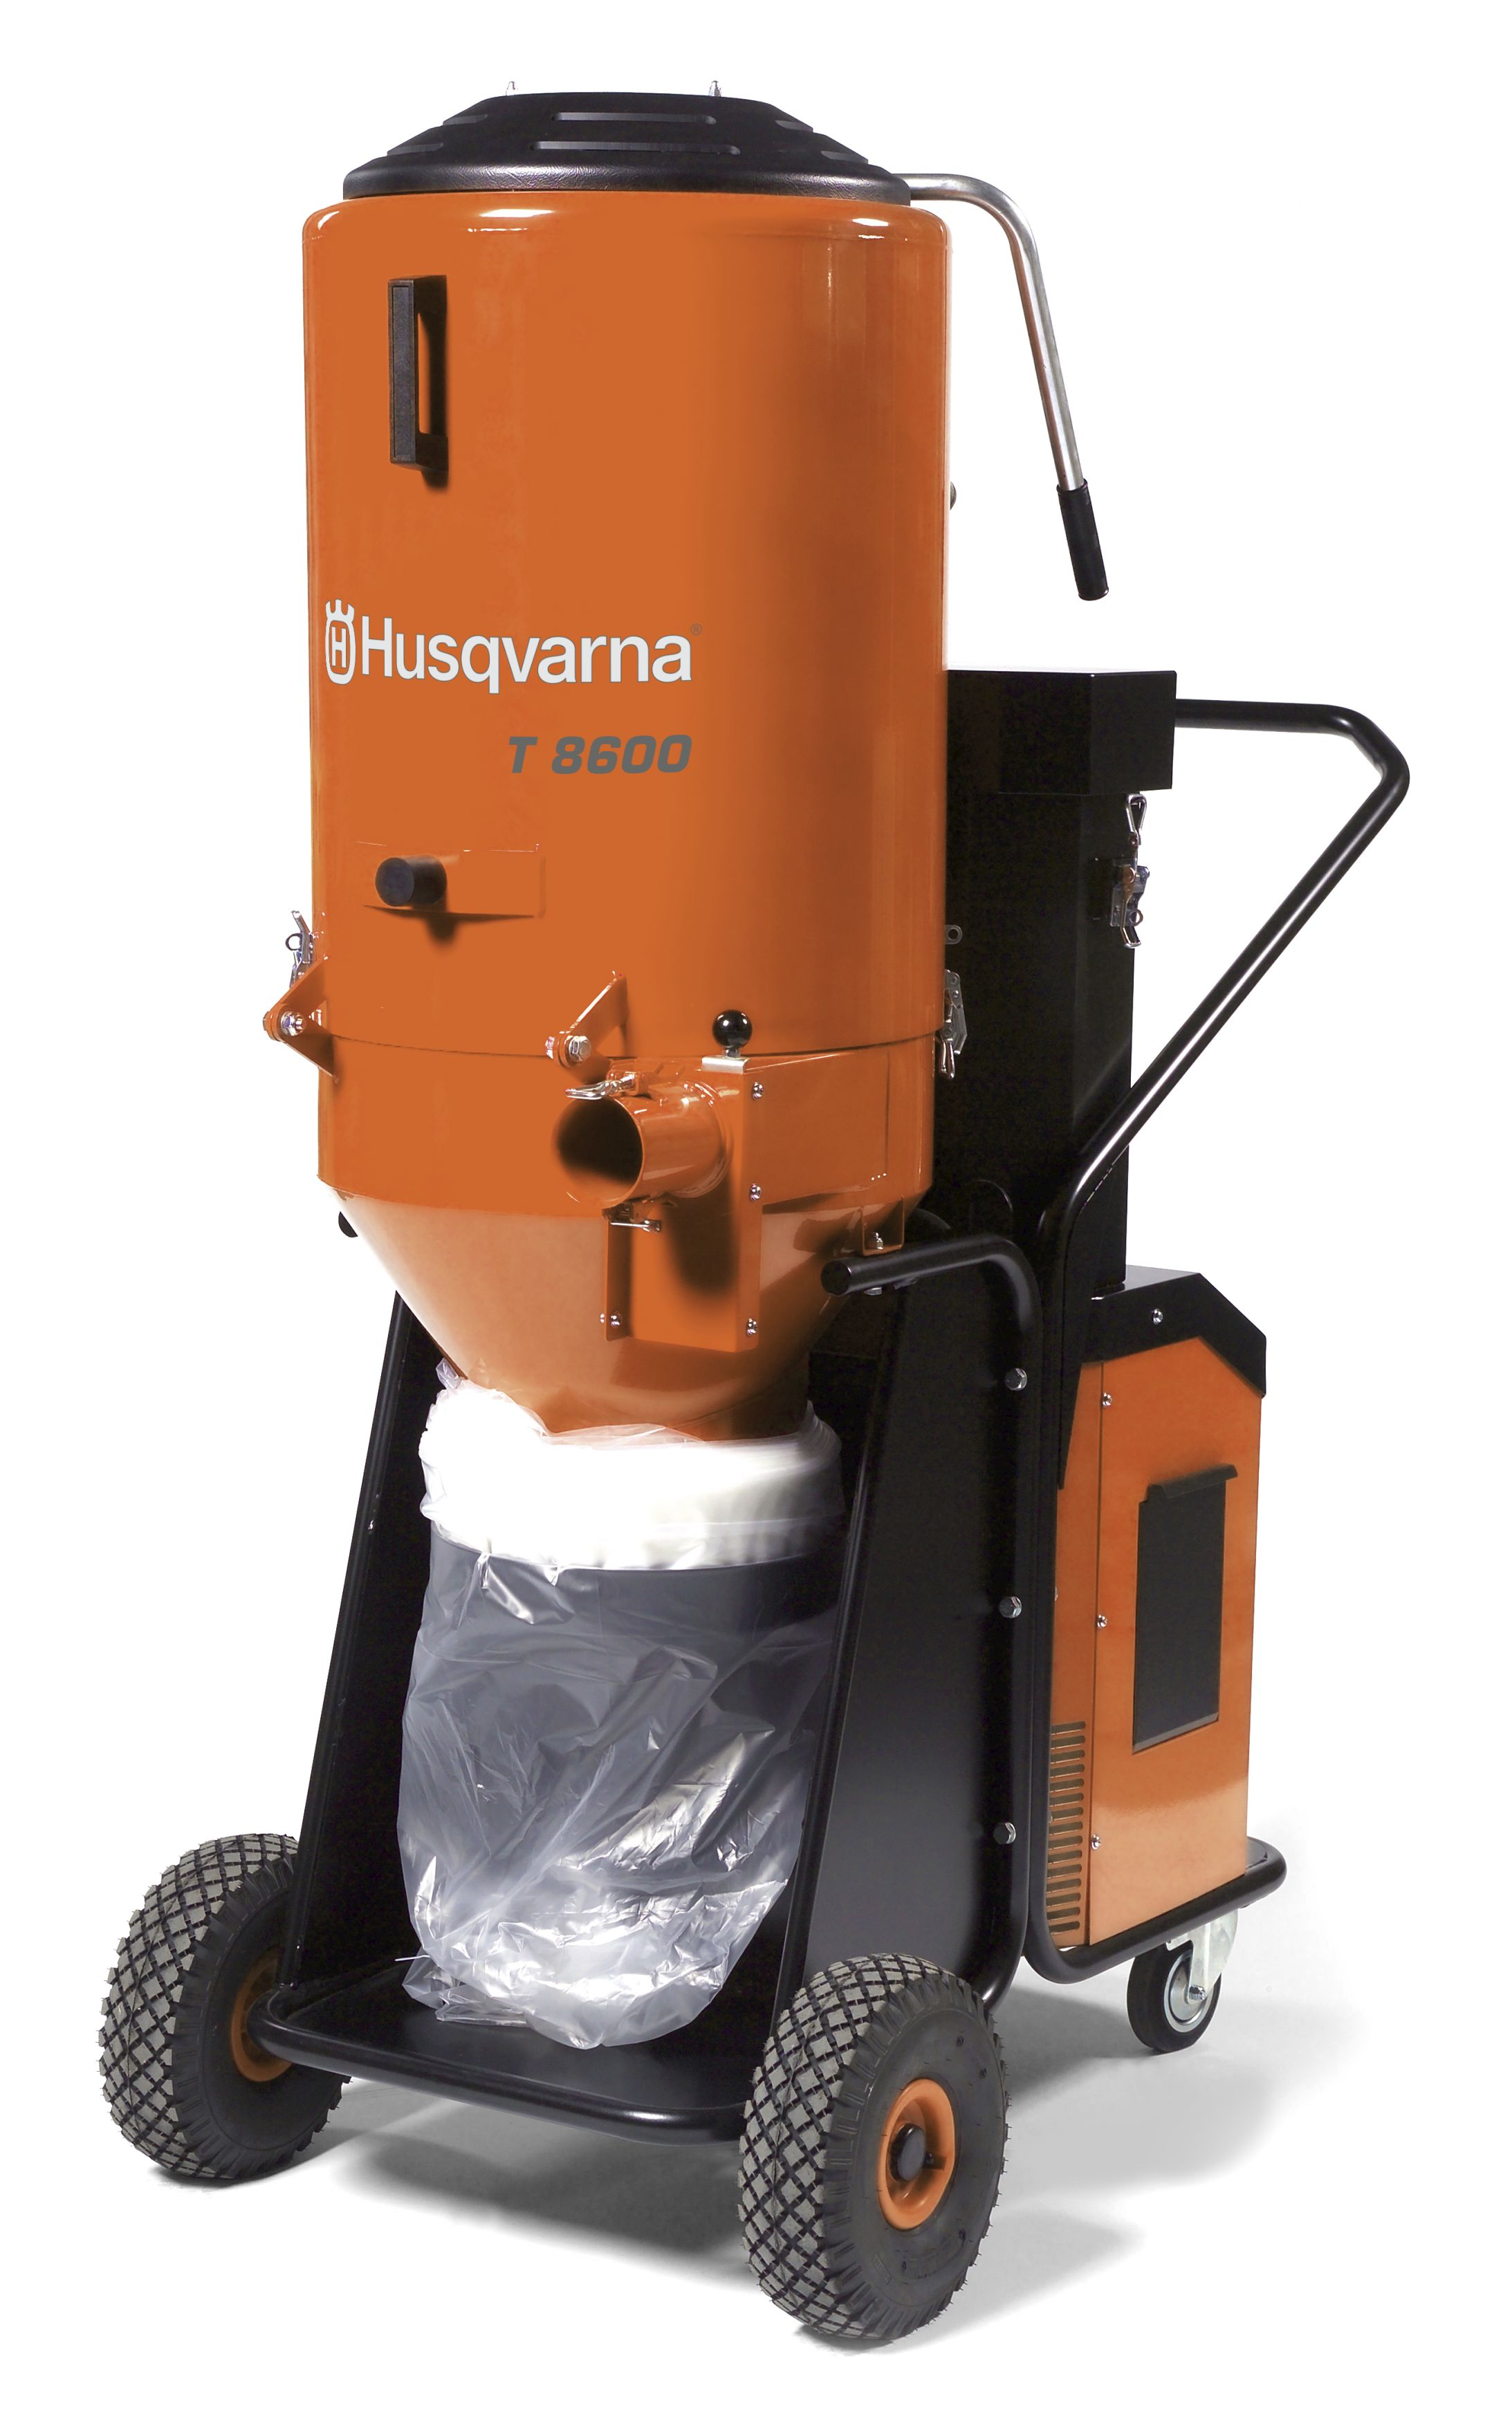 HUSQVARNA T8600 3-PHASE 480V HEPA DUST EXTRACTOR